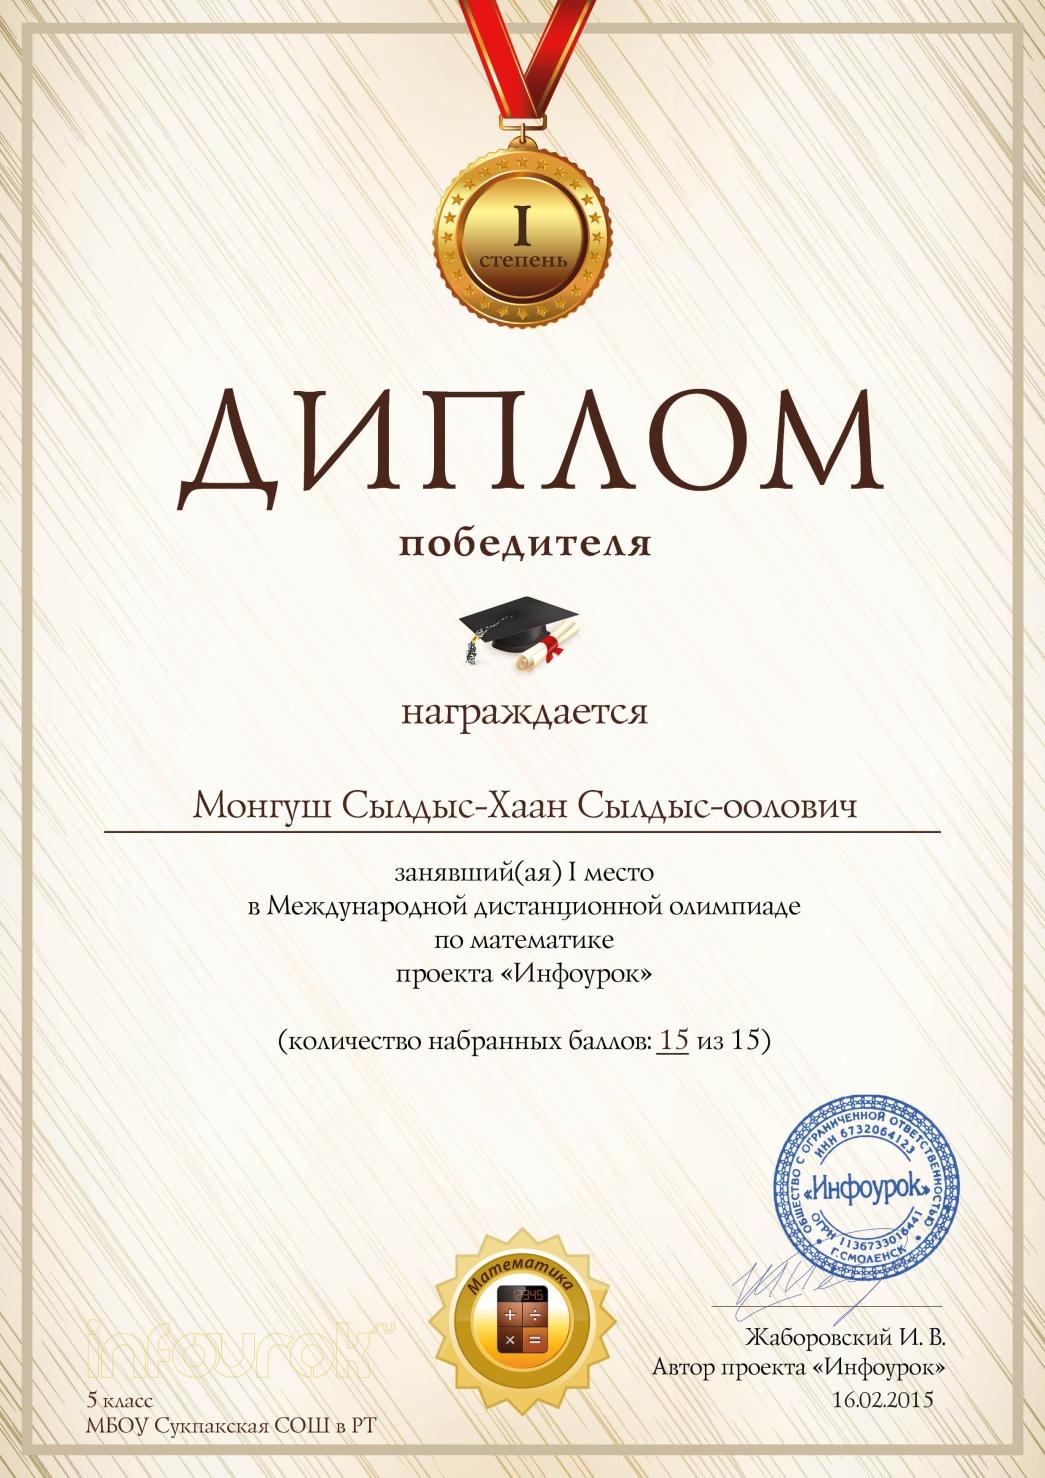 C:\Users\Снежана\Desktop\сертификаты инфоурок\олимпиада результат\format_A5_document_184944.jpg